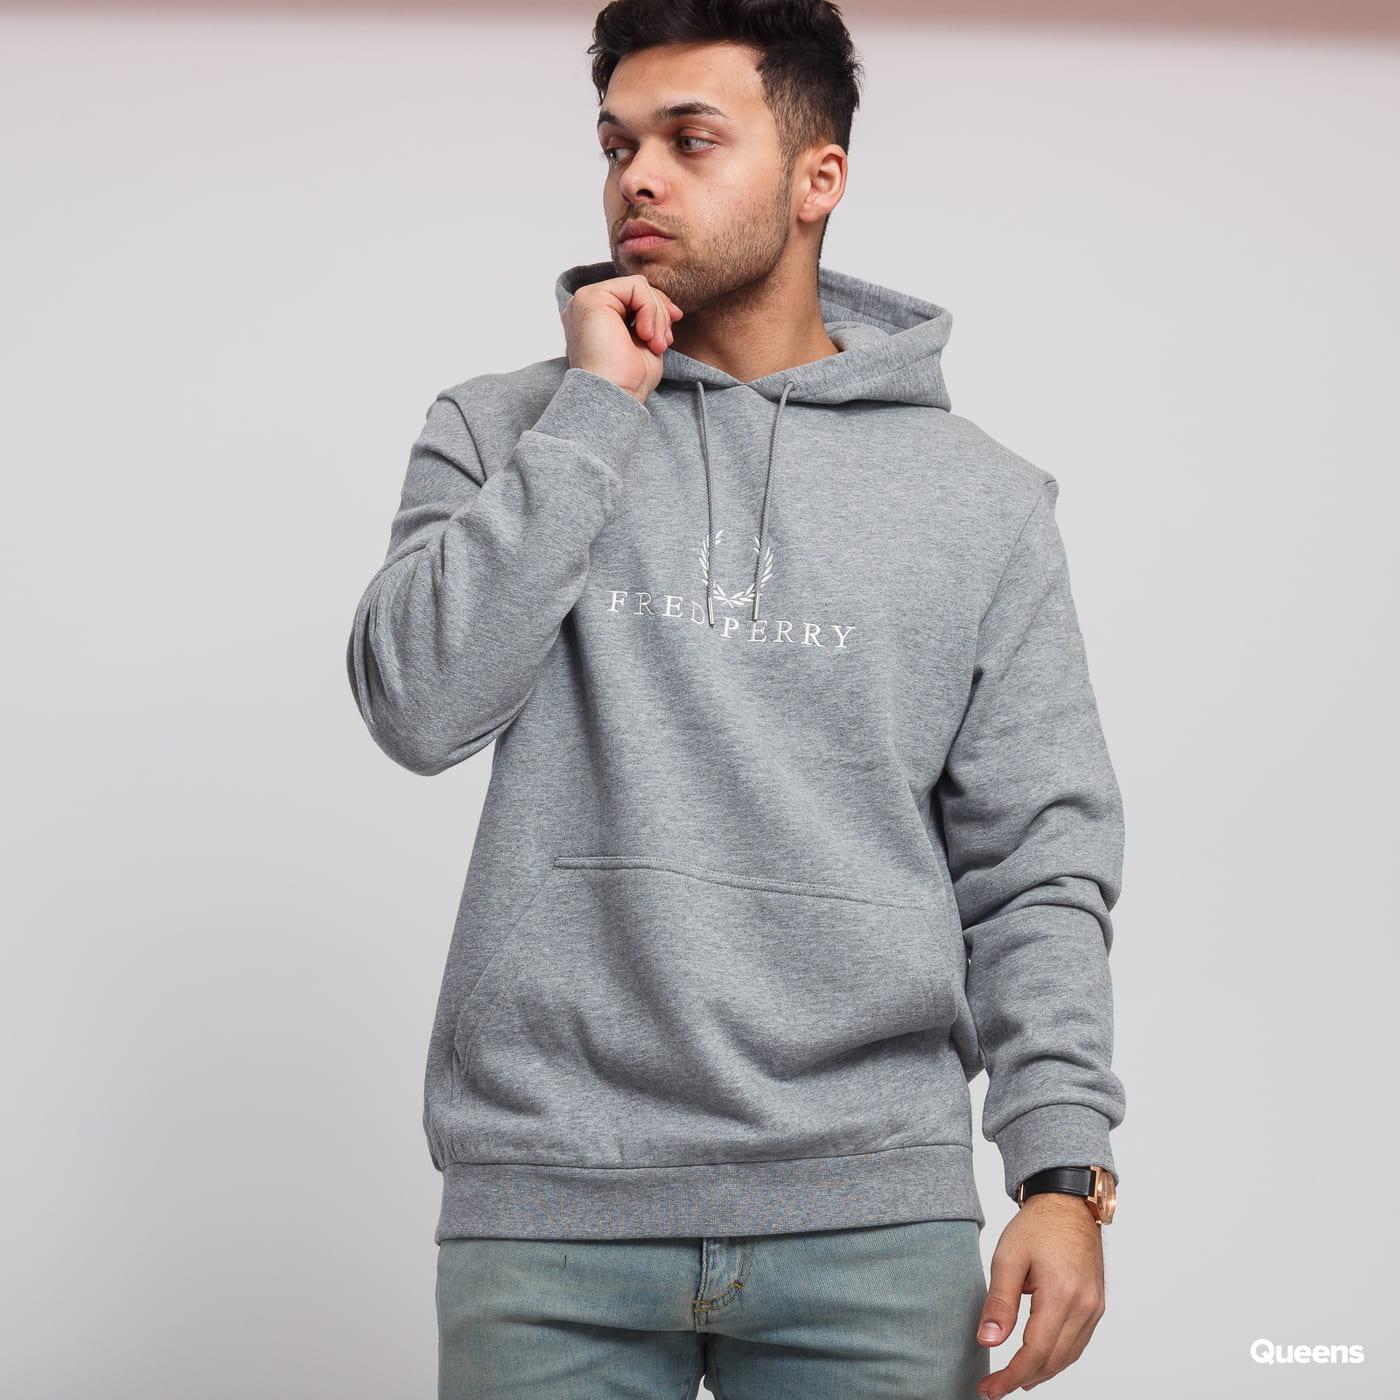 240e87372 Sweatshirt / Hoodie FRED PERRY Embroidered Hooded Sweatshirt melange gray  (J5525 420) – Queens 💚